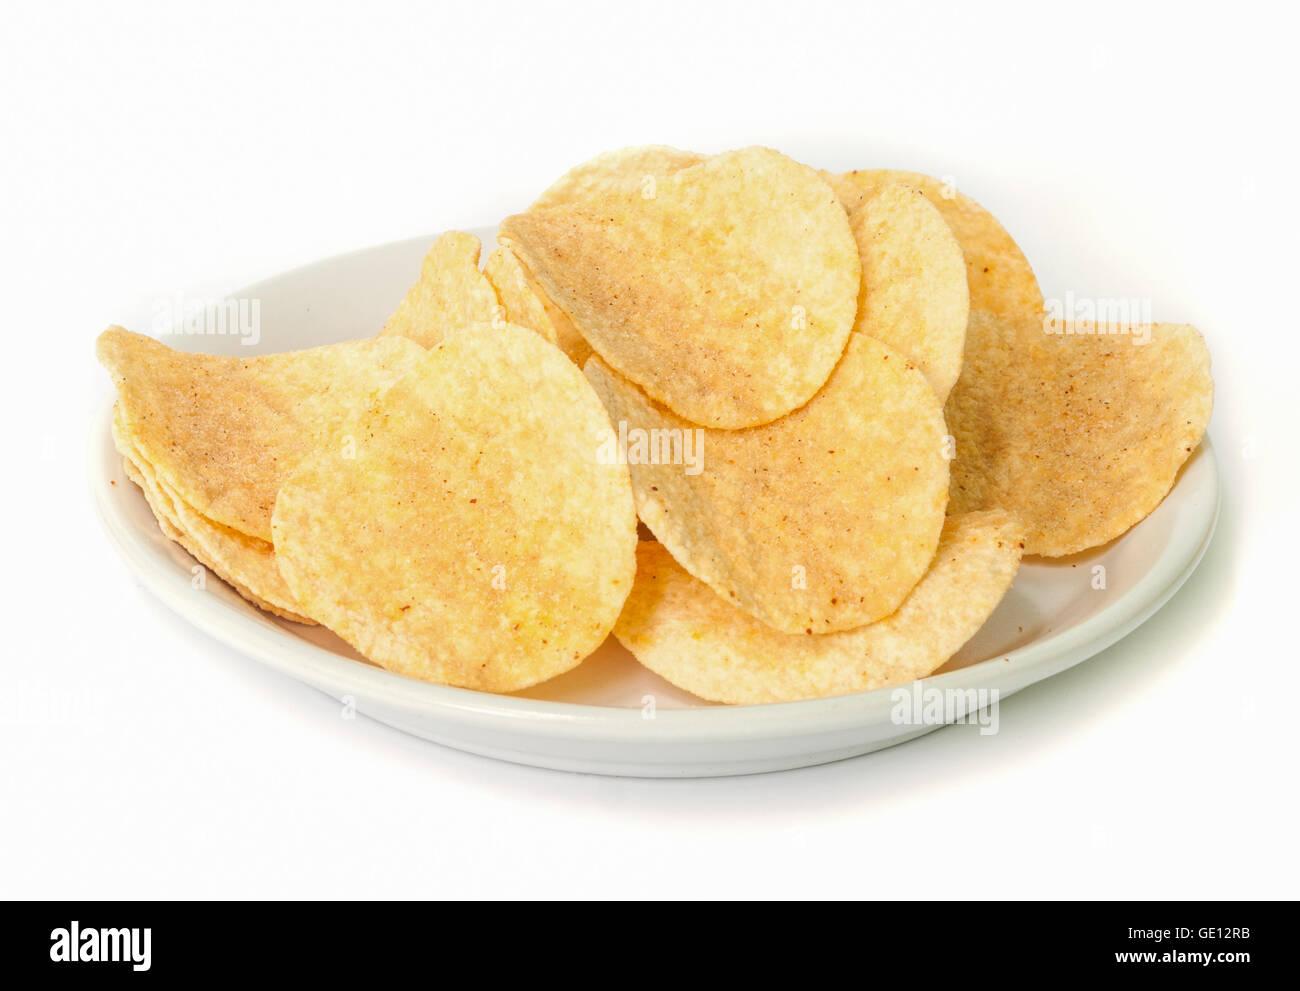 crunchy potato chips on white dish. - Stock Image